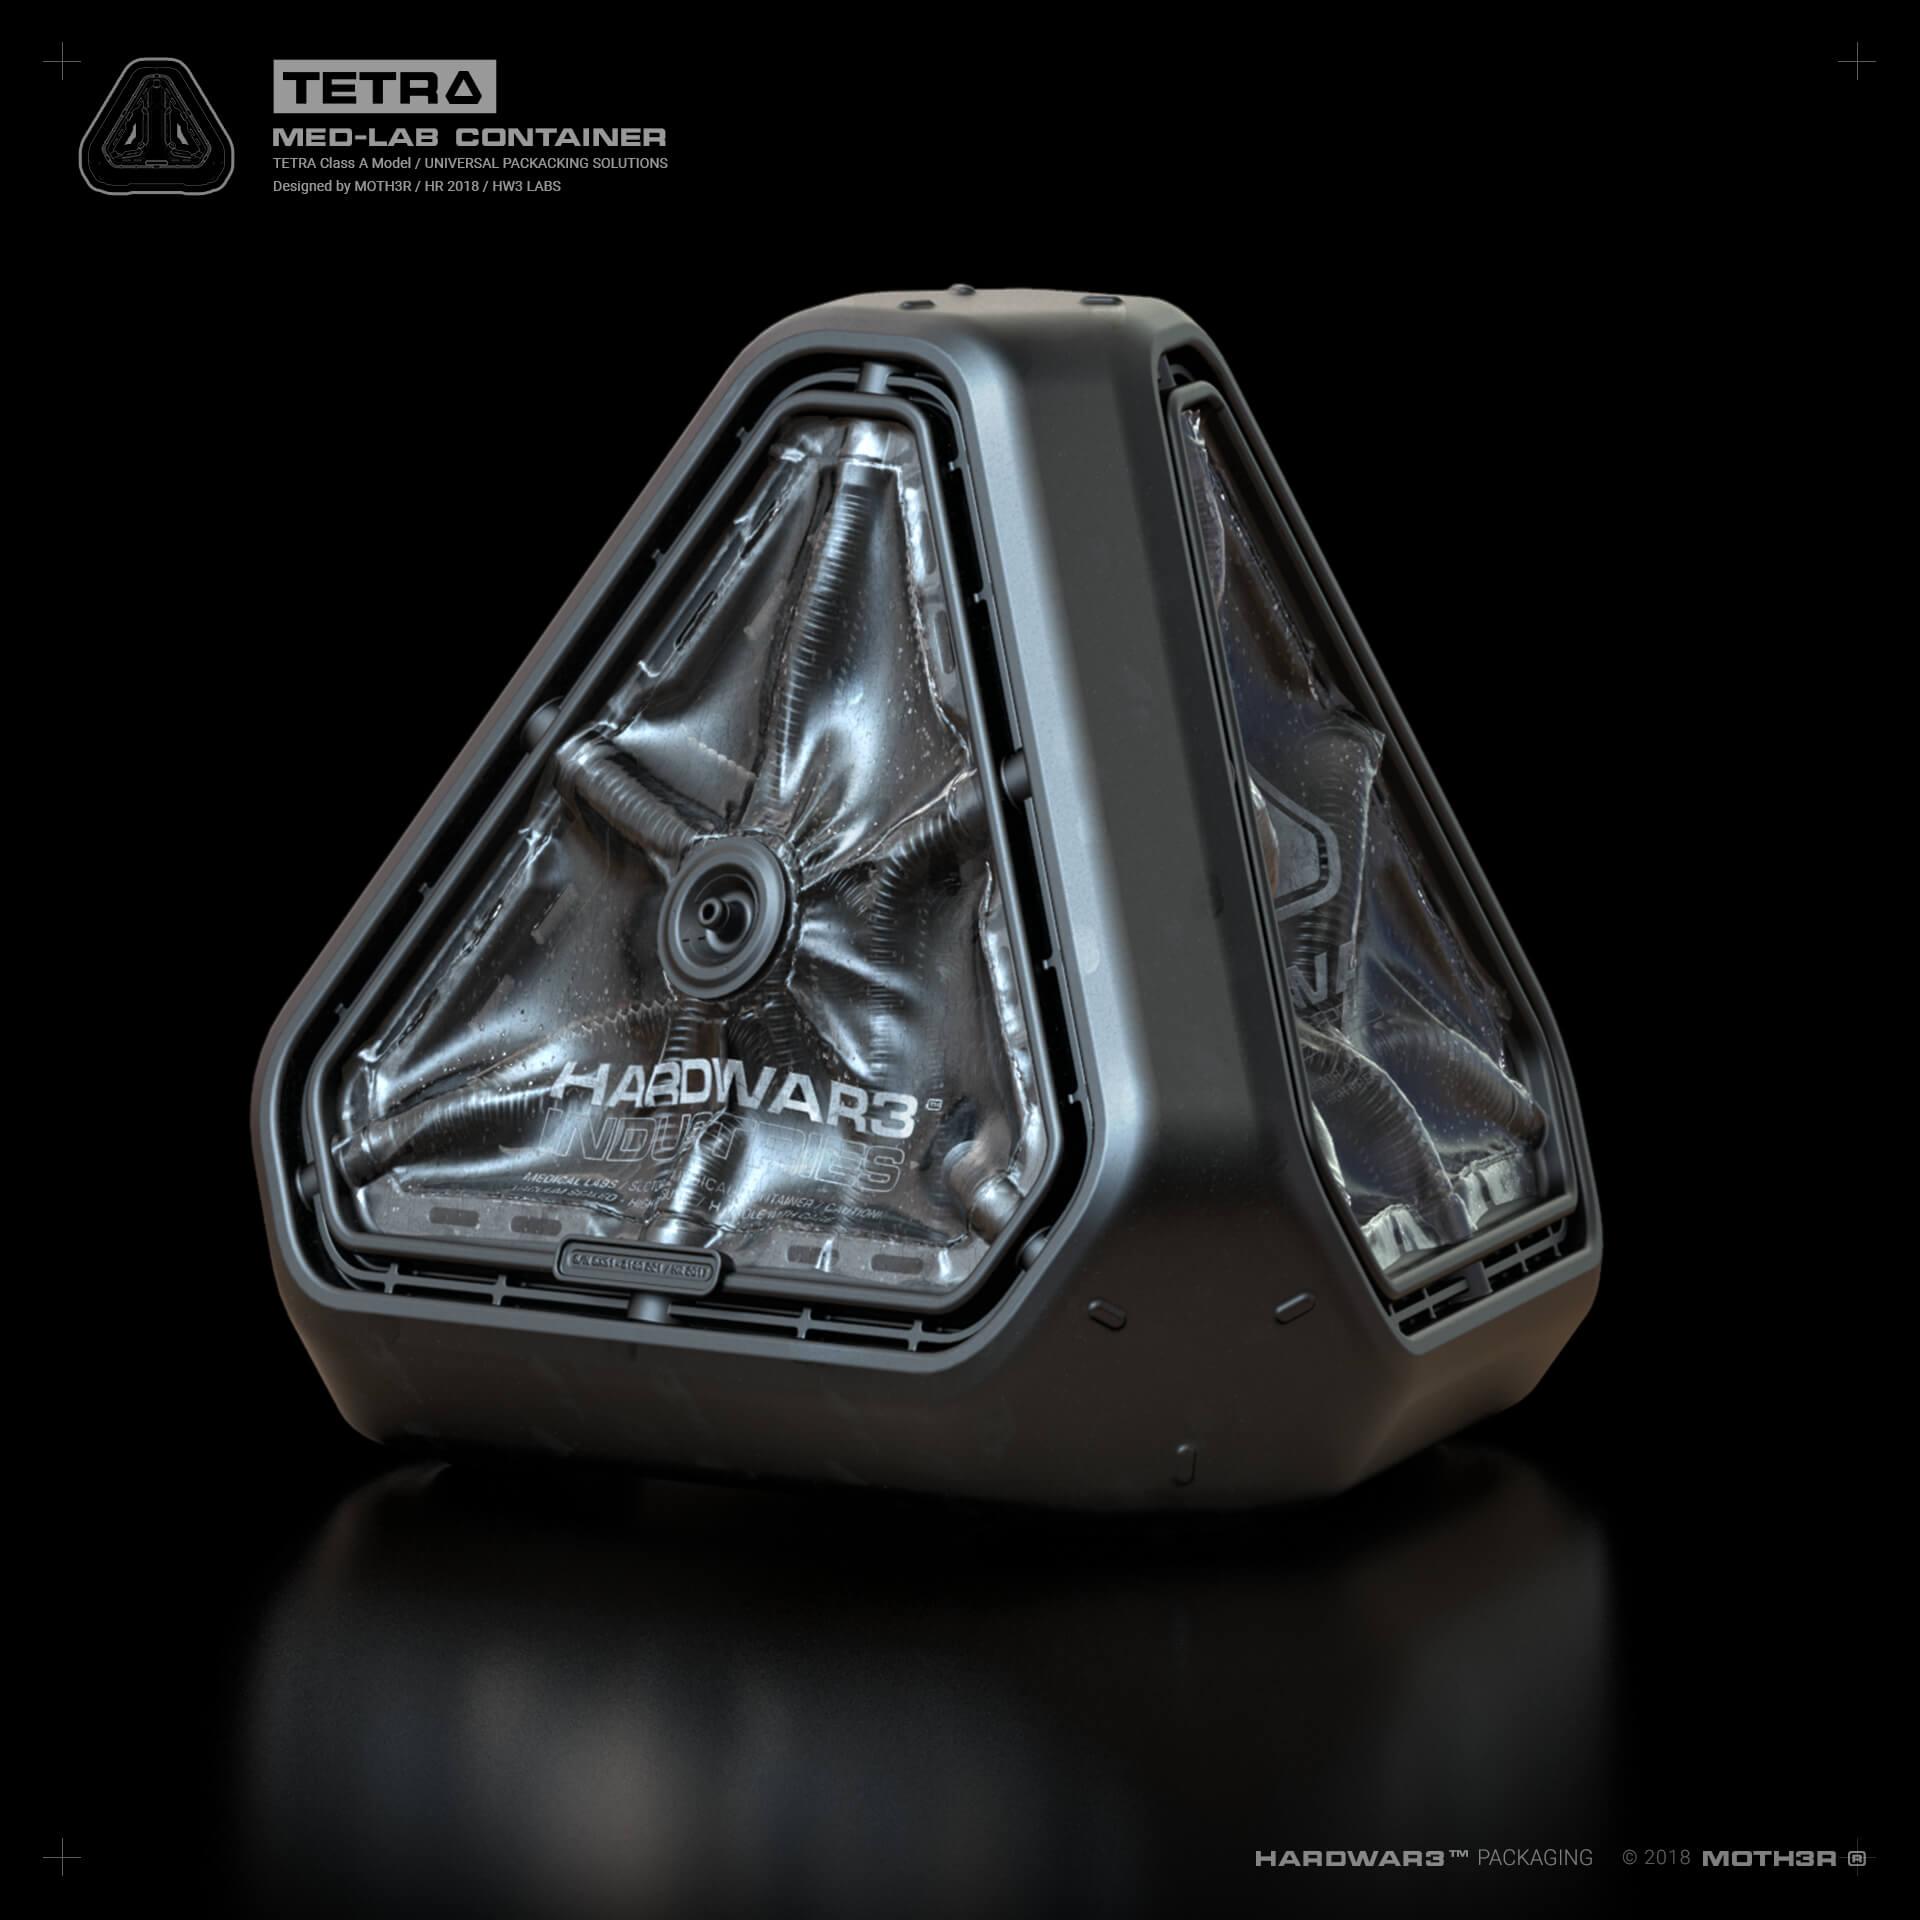 Tetra-b01.236b